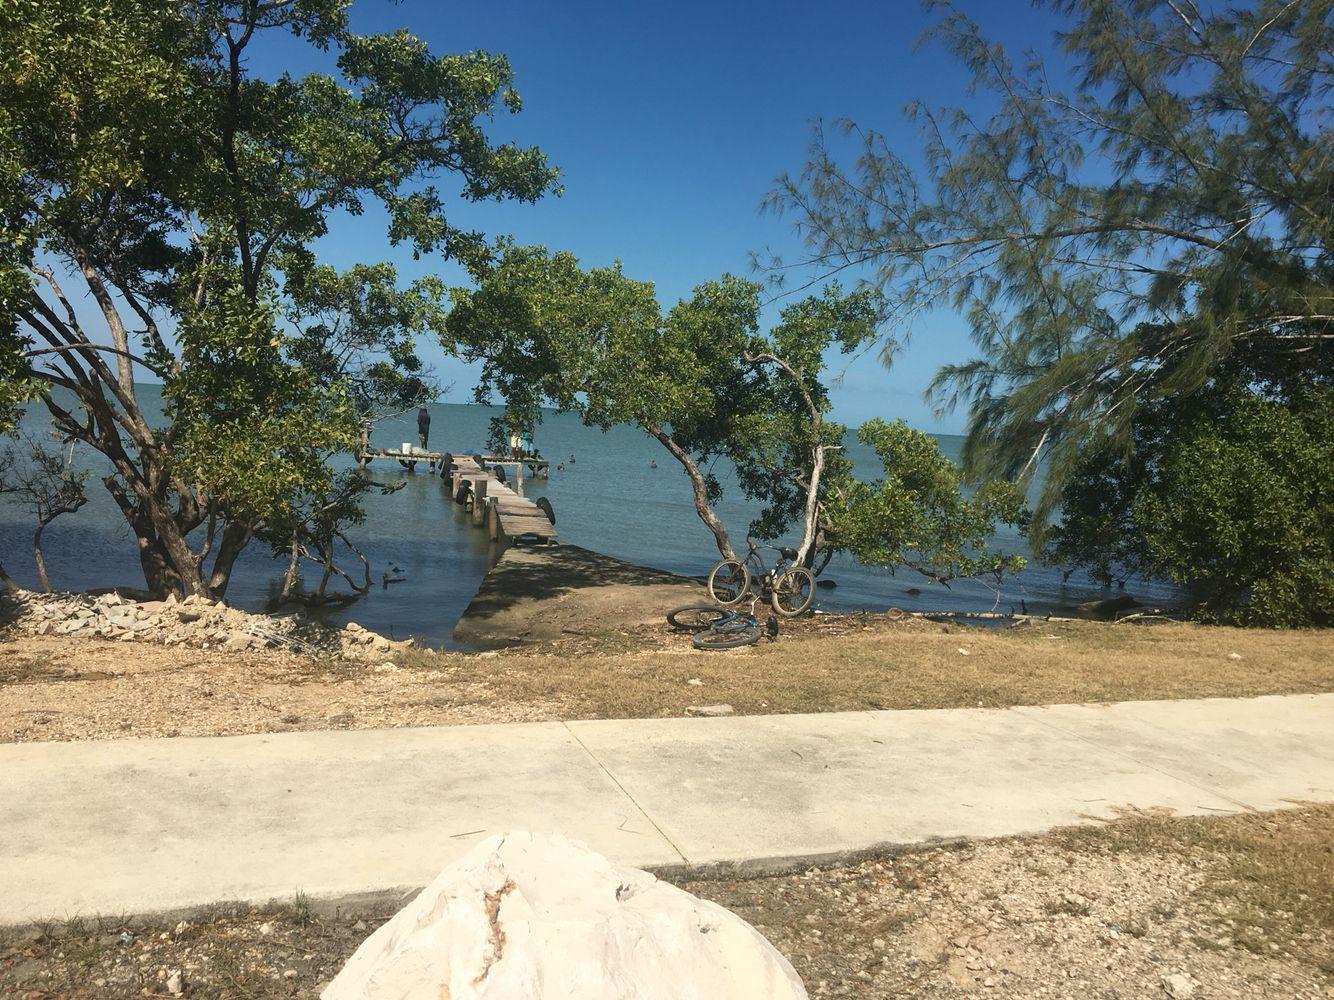 Belize Jan. 25